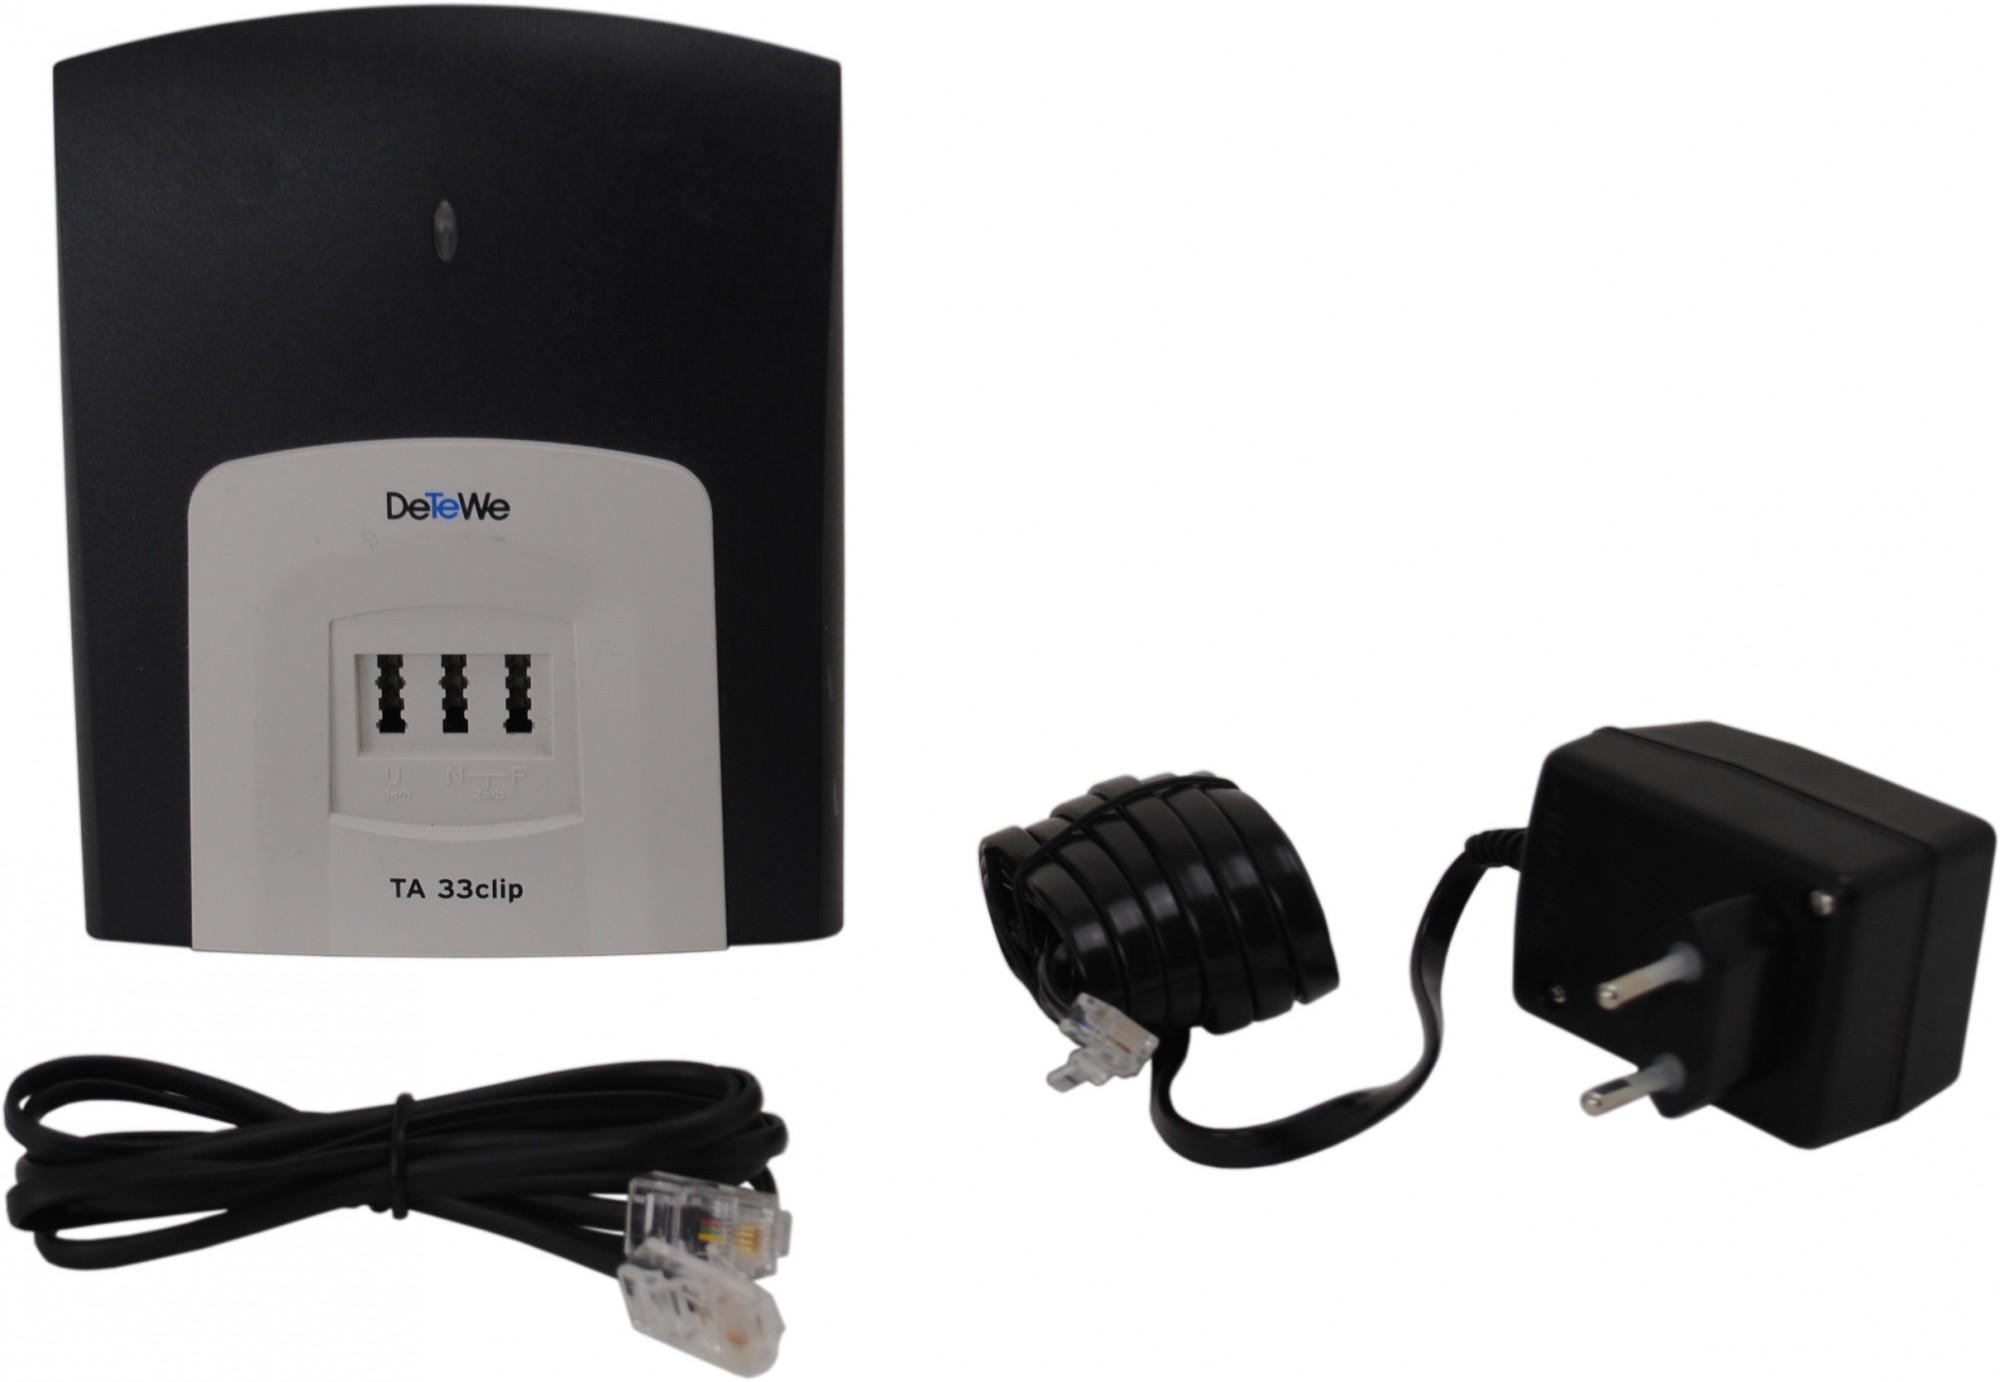 detewe ta 33clip ta33 clip a b ab wandler isdn analog adapter terminaladapter ebay. Black Bedroom Furniture Sets. Home Design Ideas